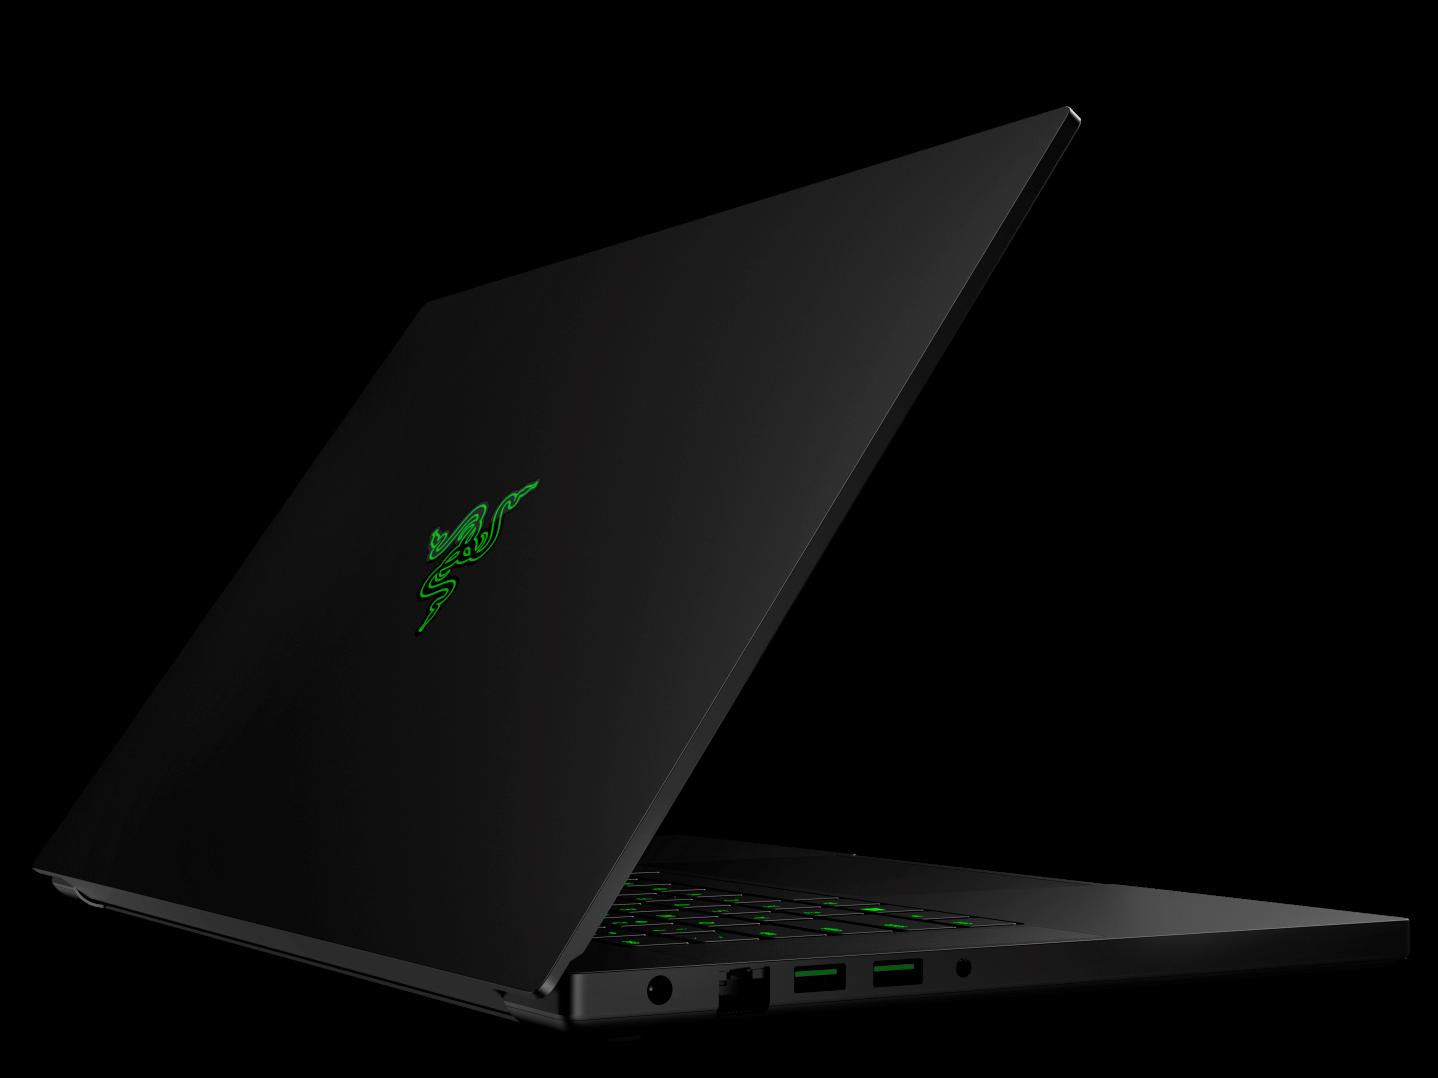 Razer Blade 15 Base Model (i7-8750H, GTX 1060 Max-Q) Laptop